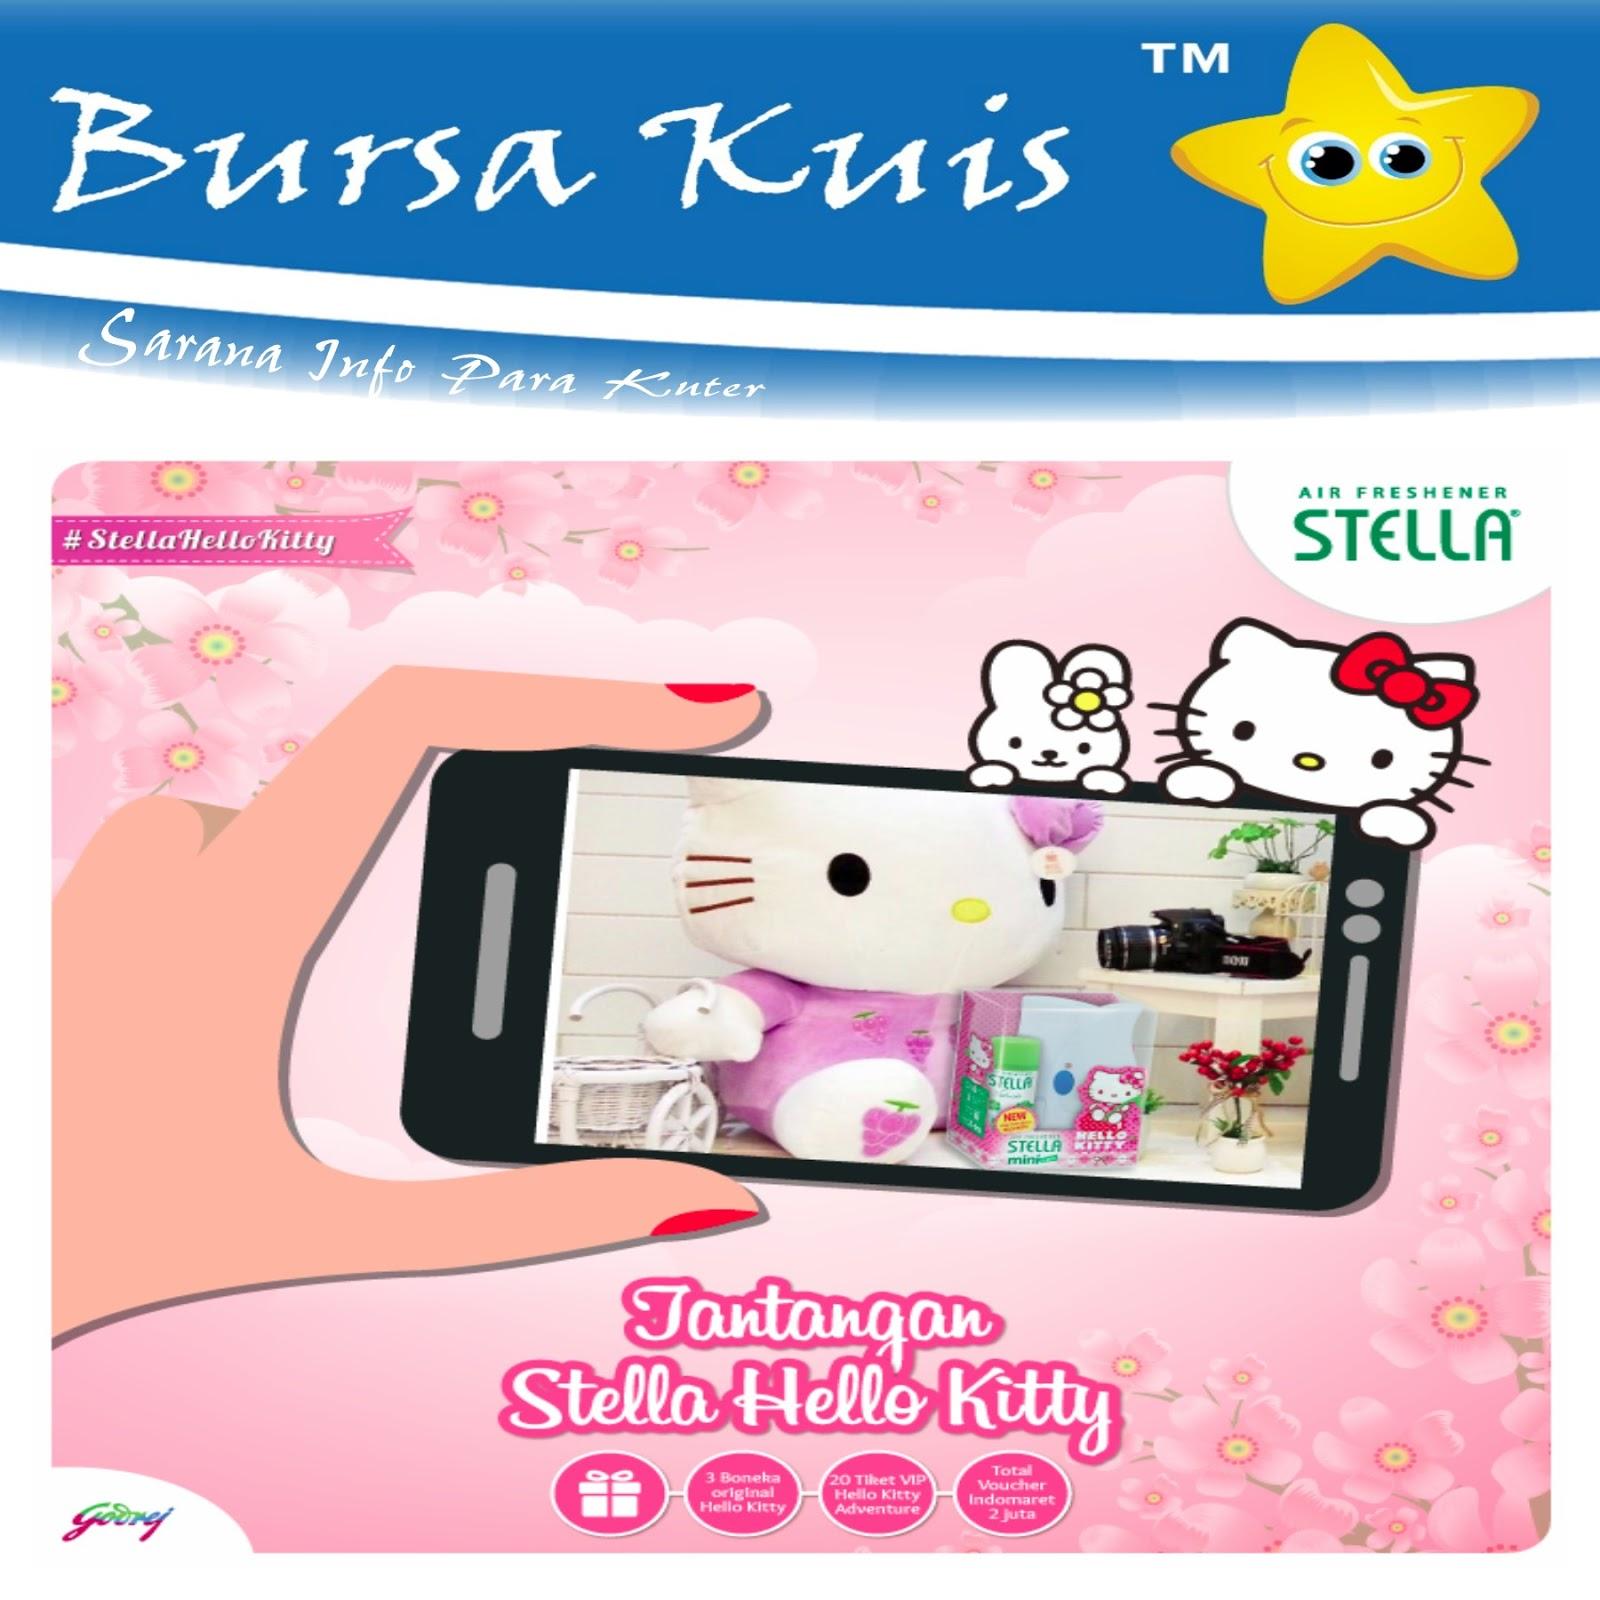 Kuis Tantangan Stella Hello Kitty Berhadiah Voucher Belanja Indomart Kali Ini Ada Dari Air Freshener Yaitu Stellahellokitty Indomaret Senilai 2 Juta Rupiah